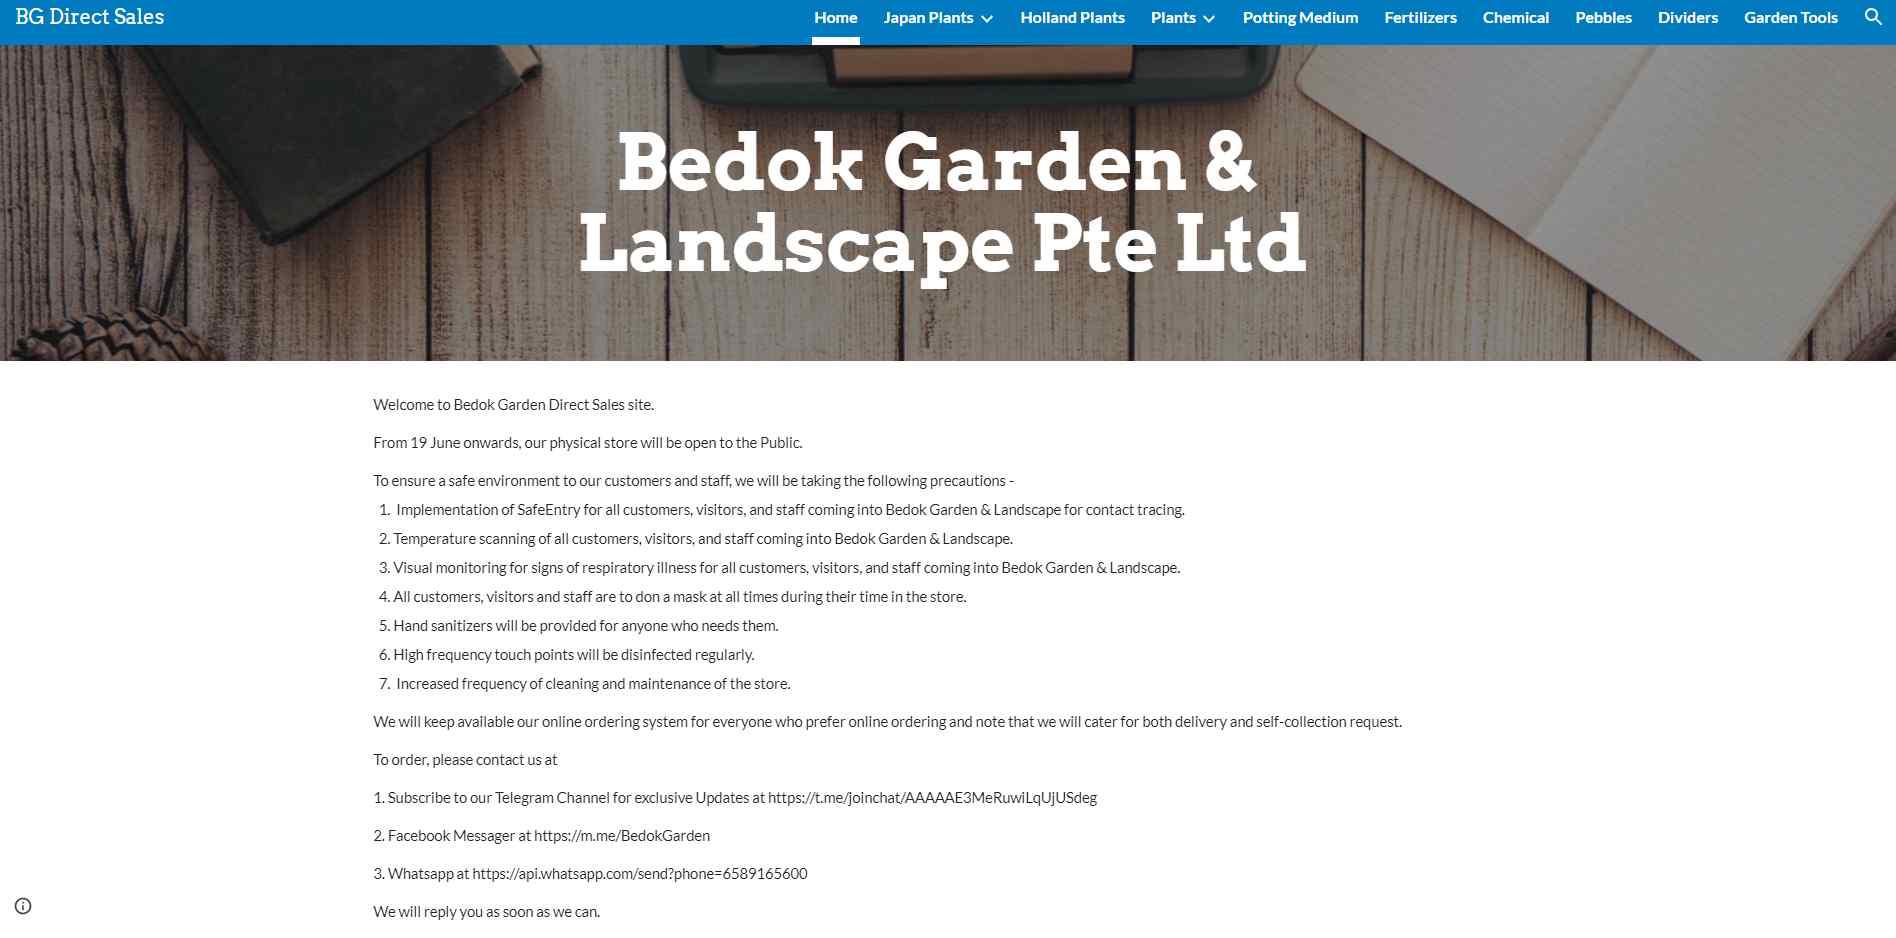 bedok garden Top Plant Nurseries in Singapore